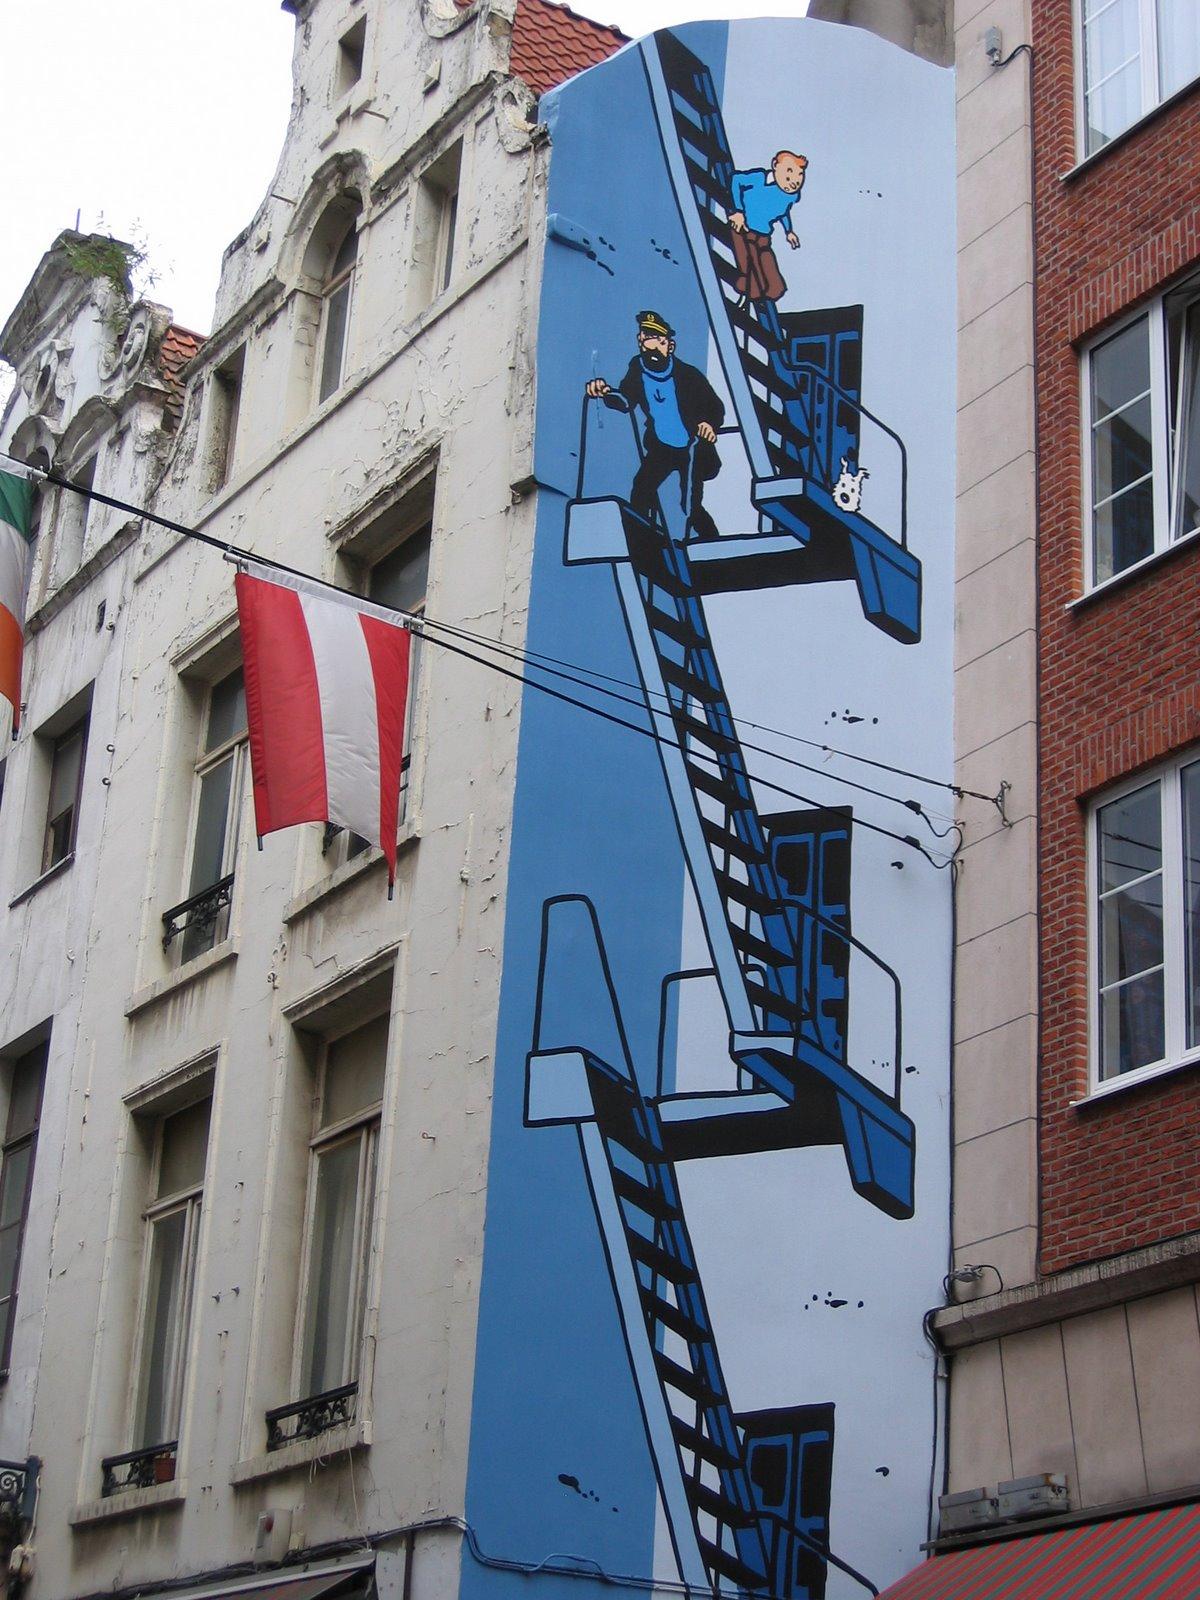 Building in Brussels